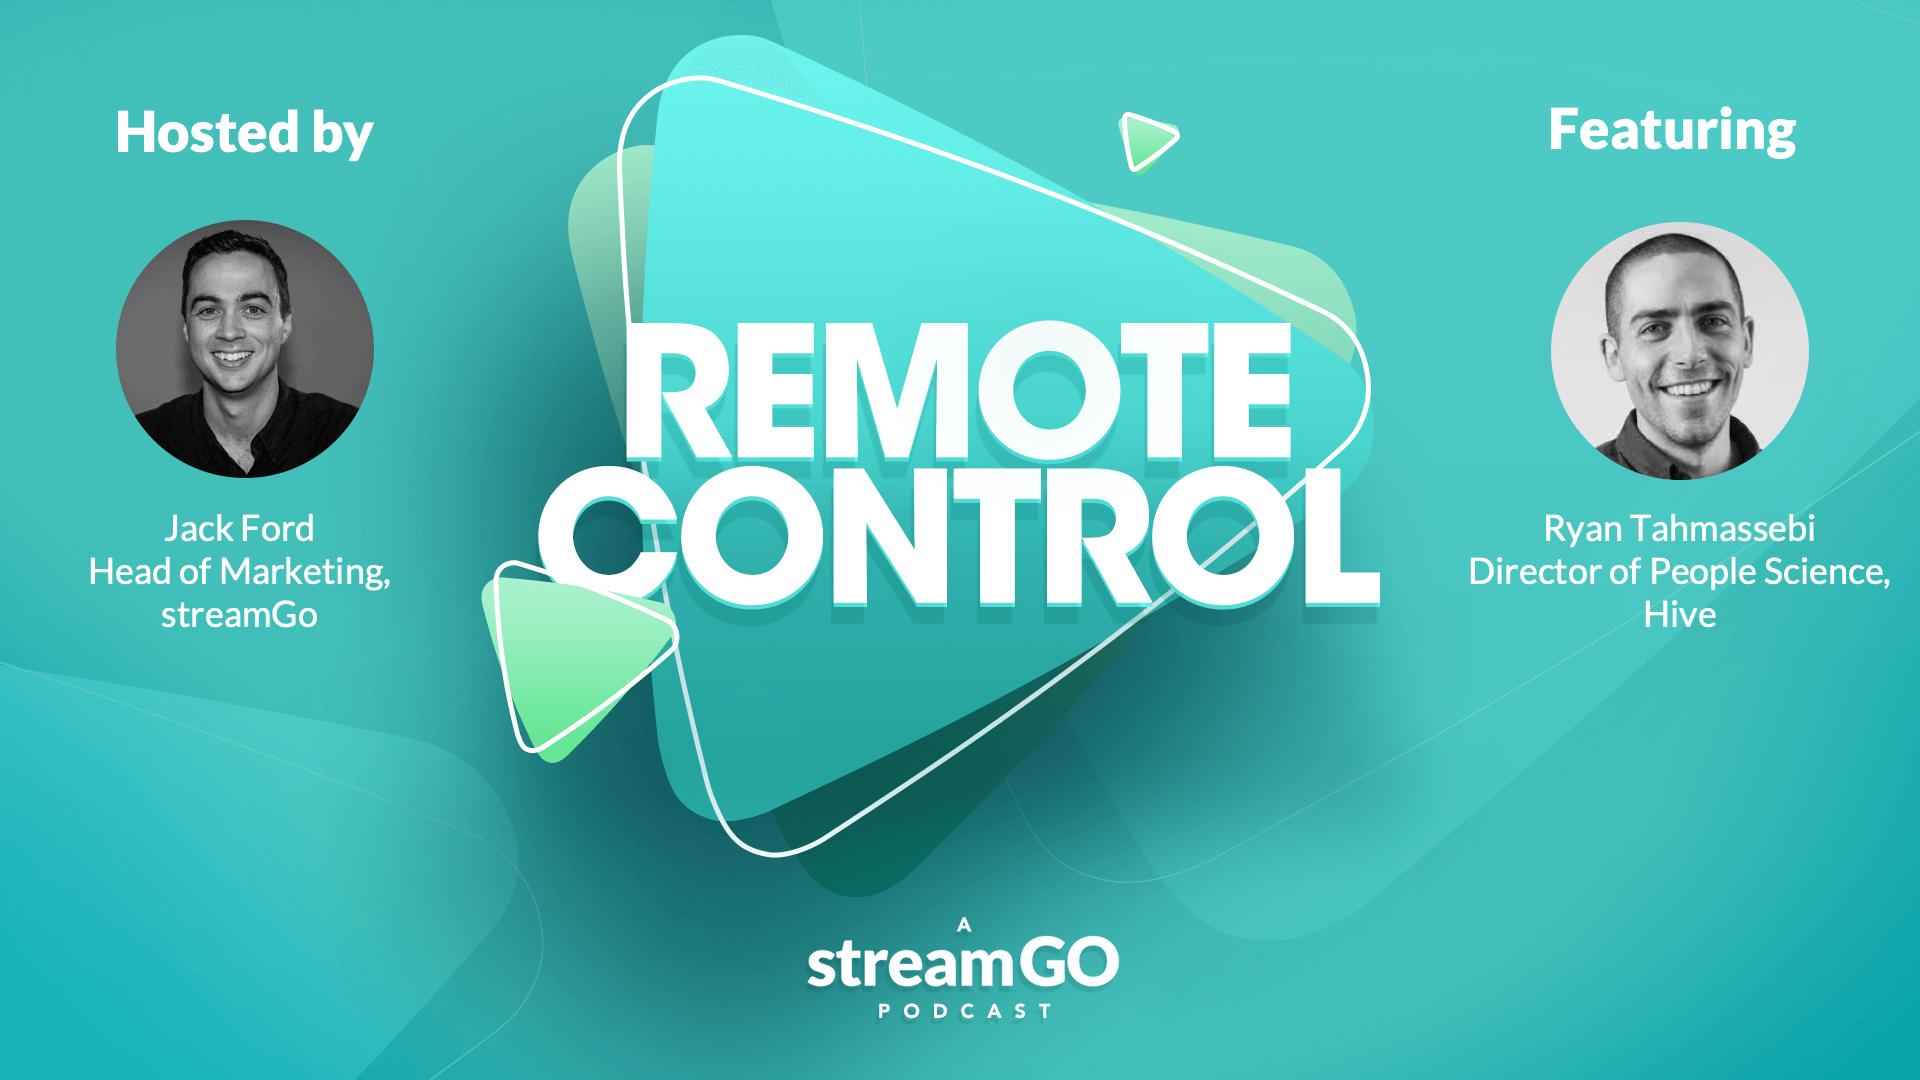 Remote Control - Ryan Tahmassebi